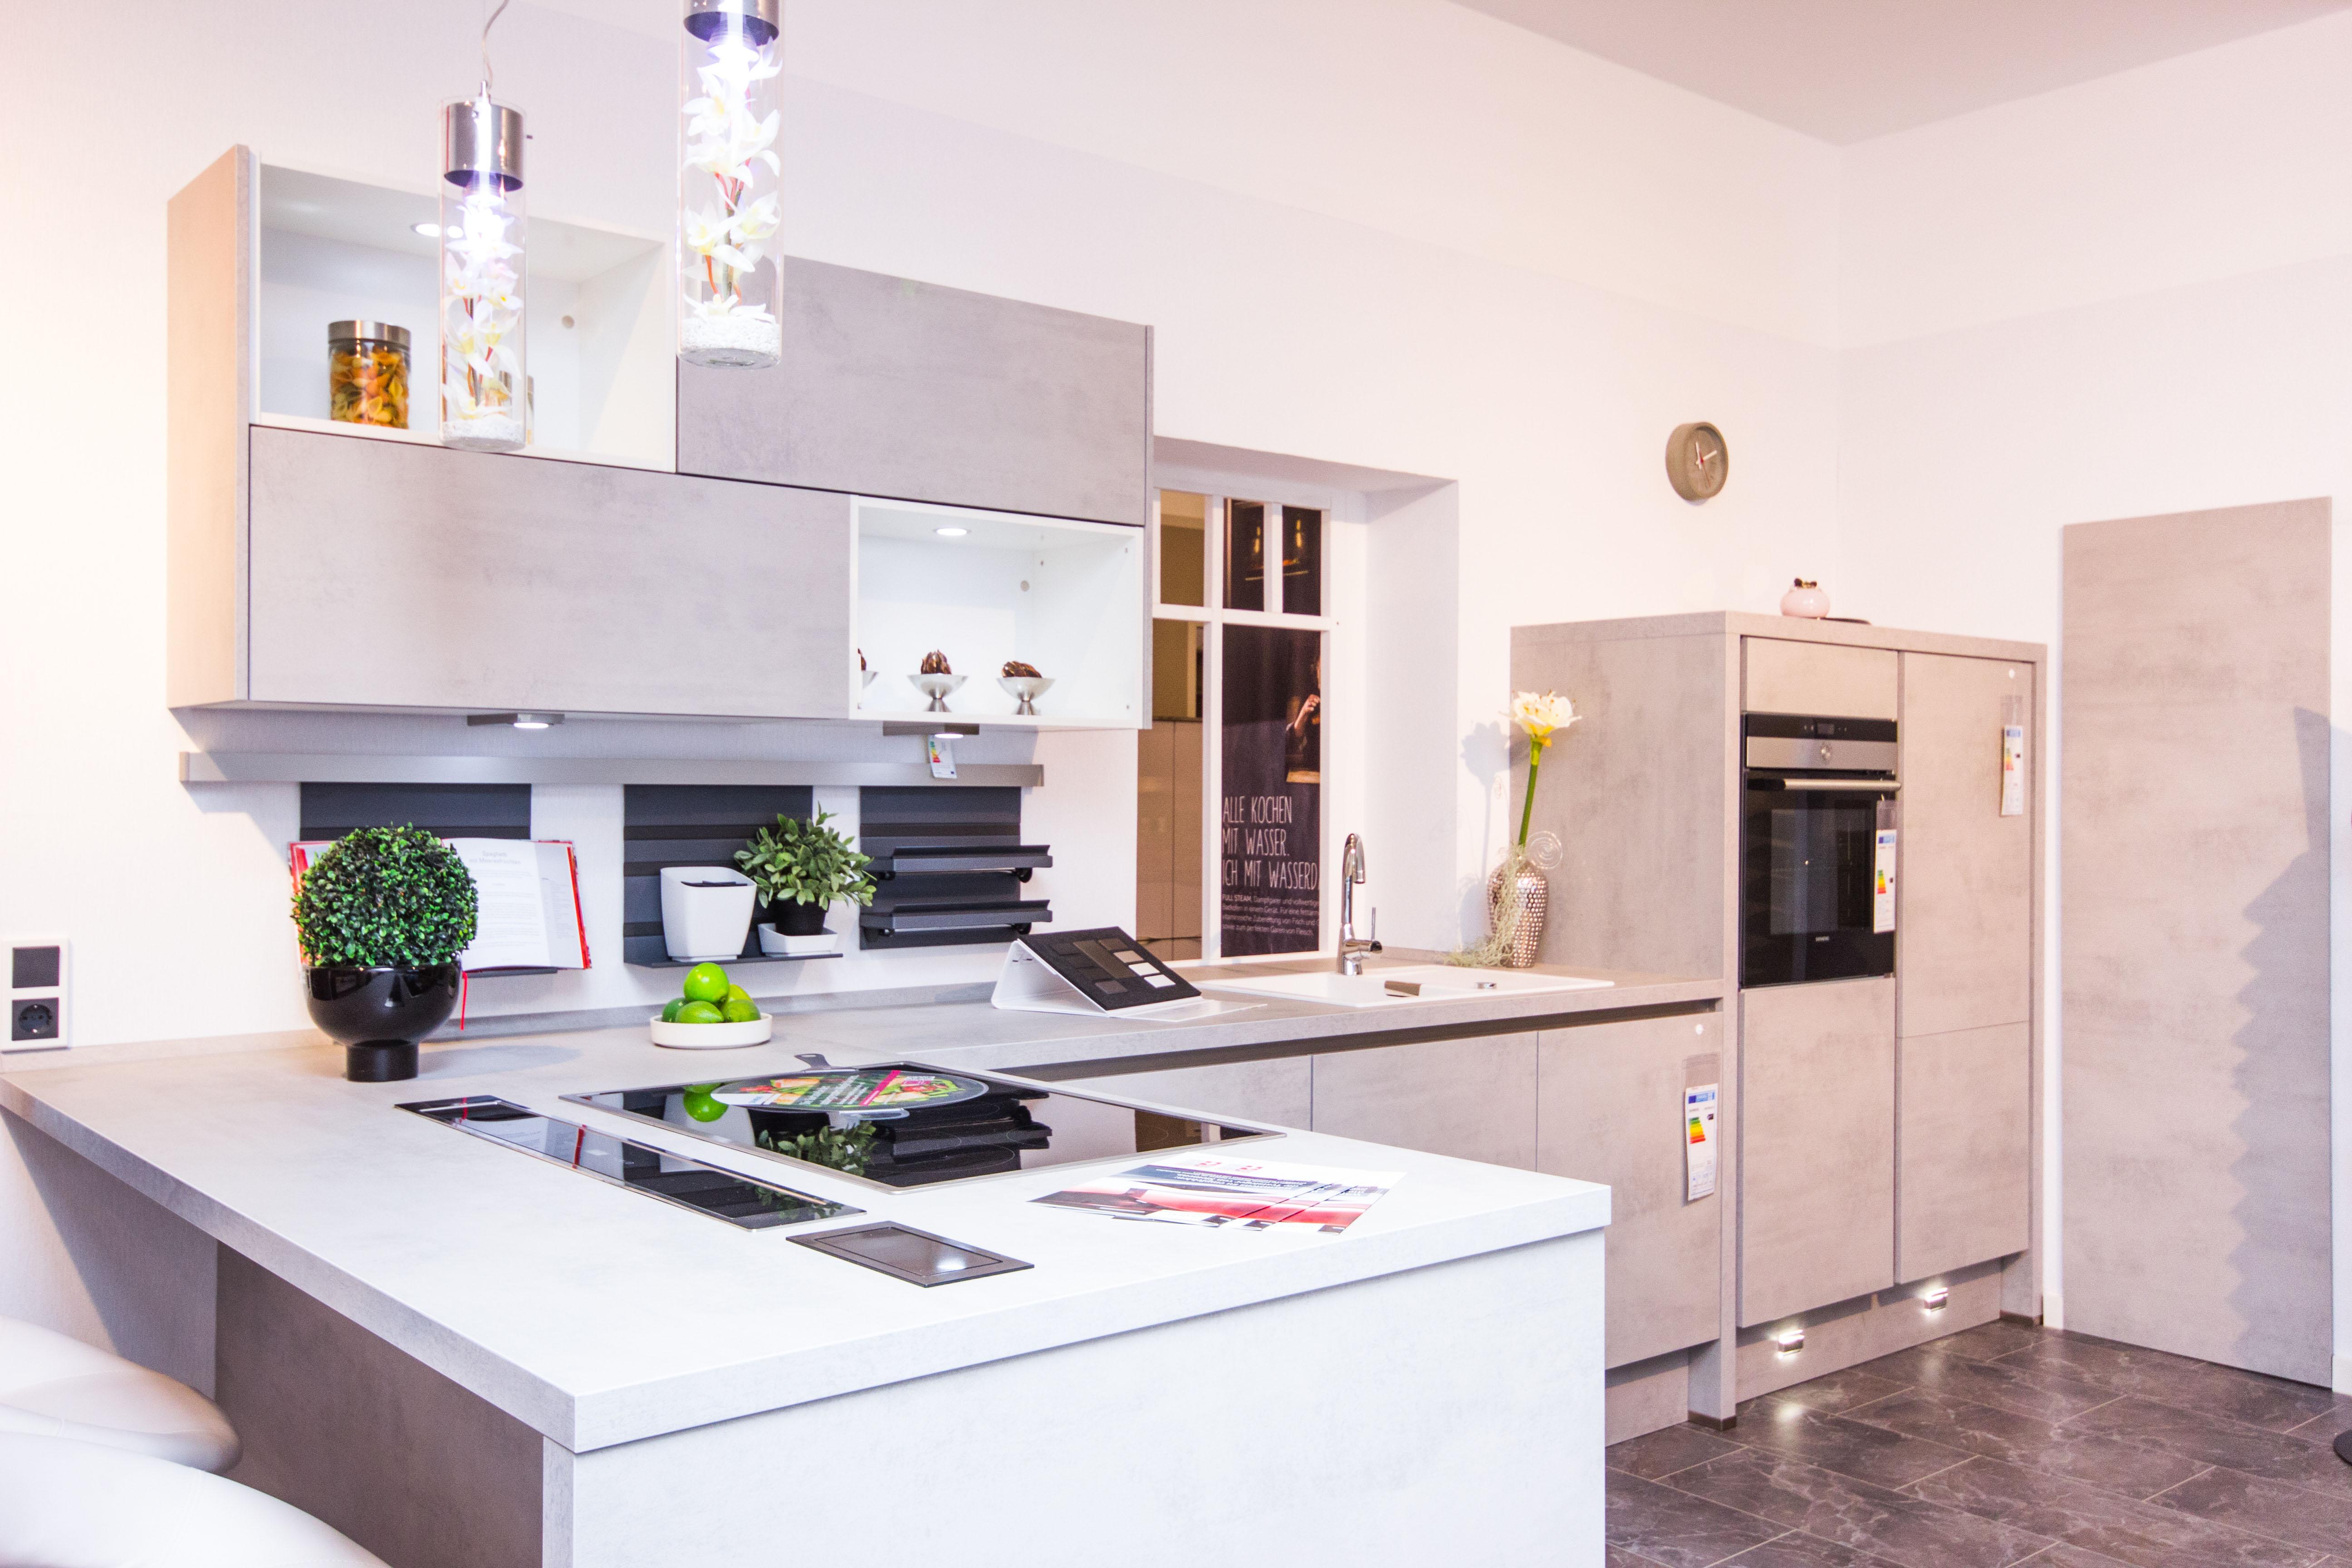 k che co halle saale in 06112 halle saale. Black Bedroom Furniture Sets. Home Design Ideas